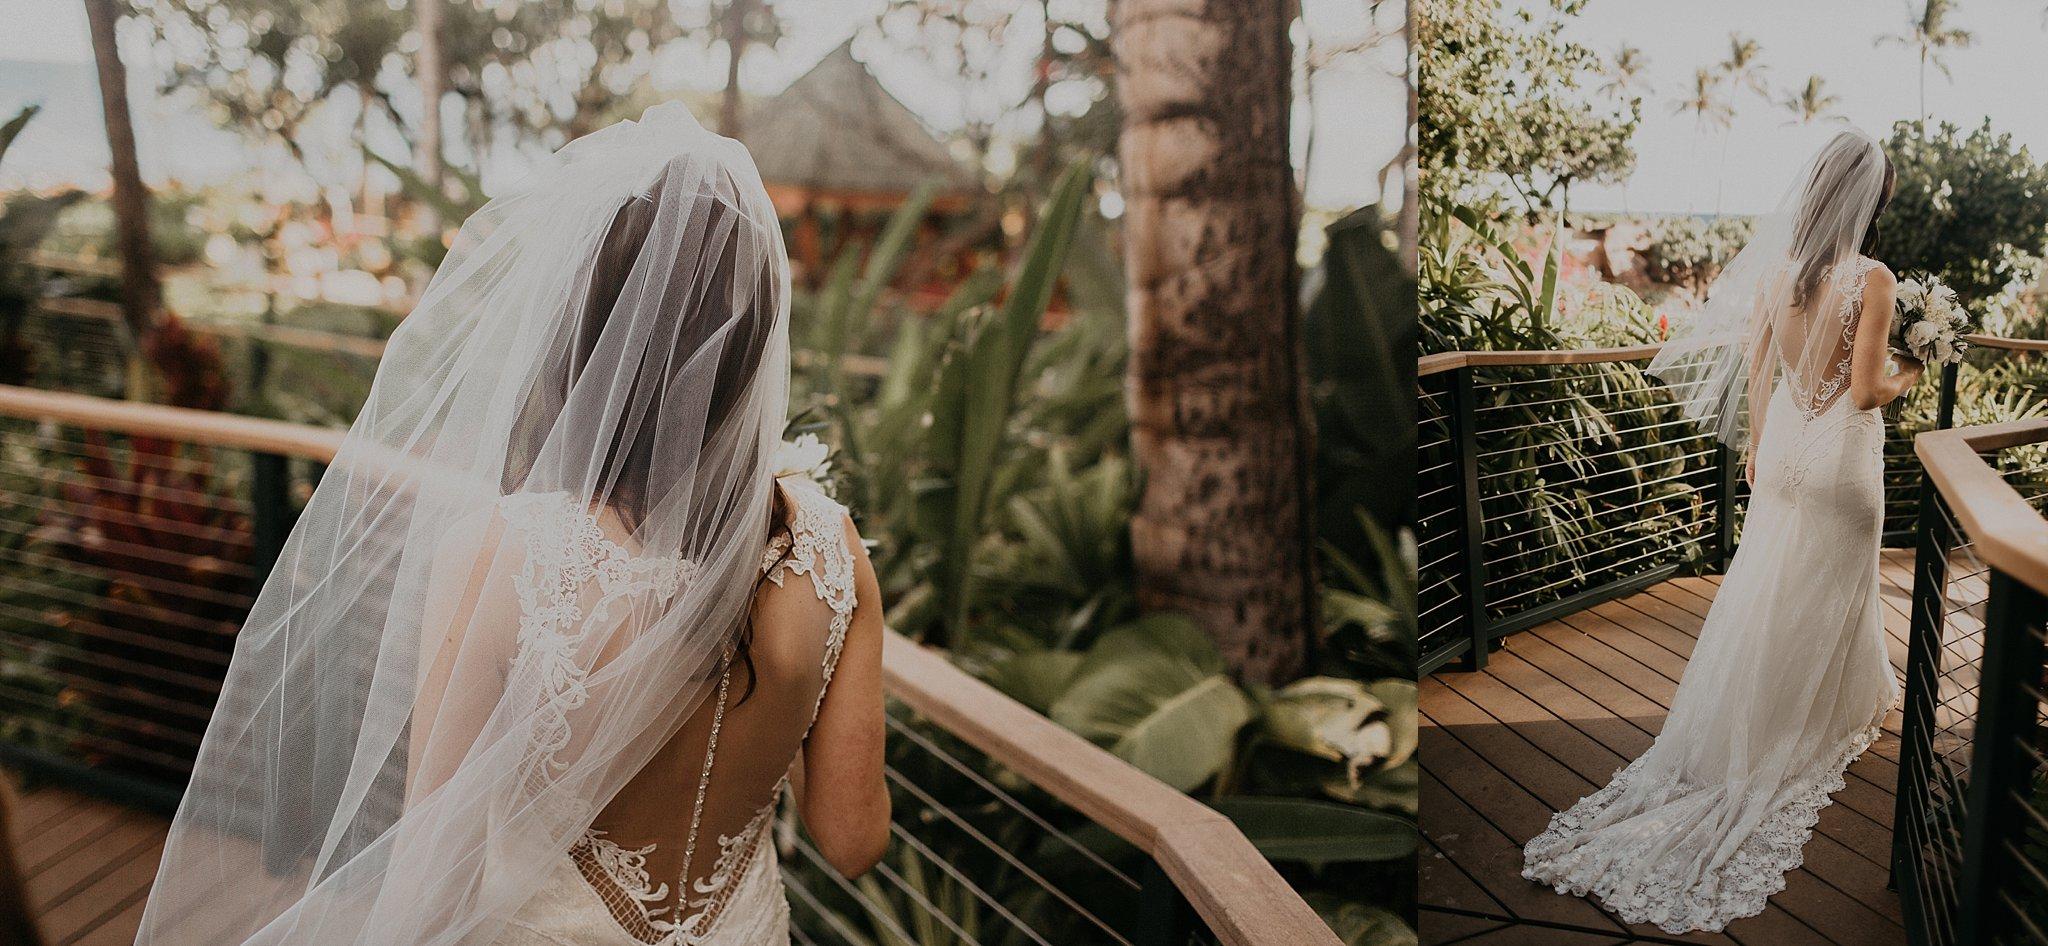 samantha_mcfarlen_bellingham_washington_engagement_photography_seattle_wedding_photographer_0197.jpg